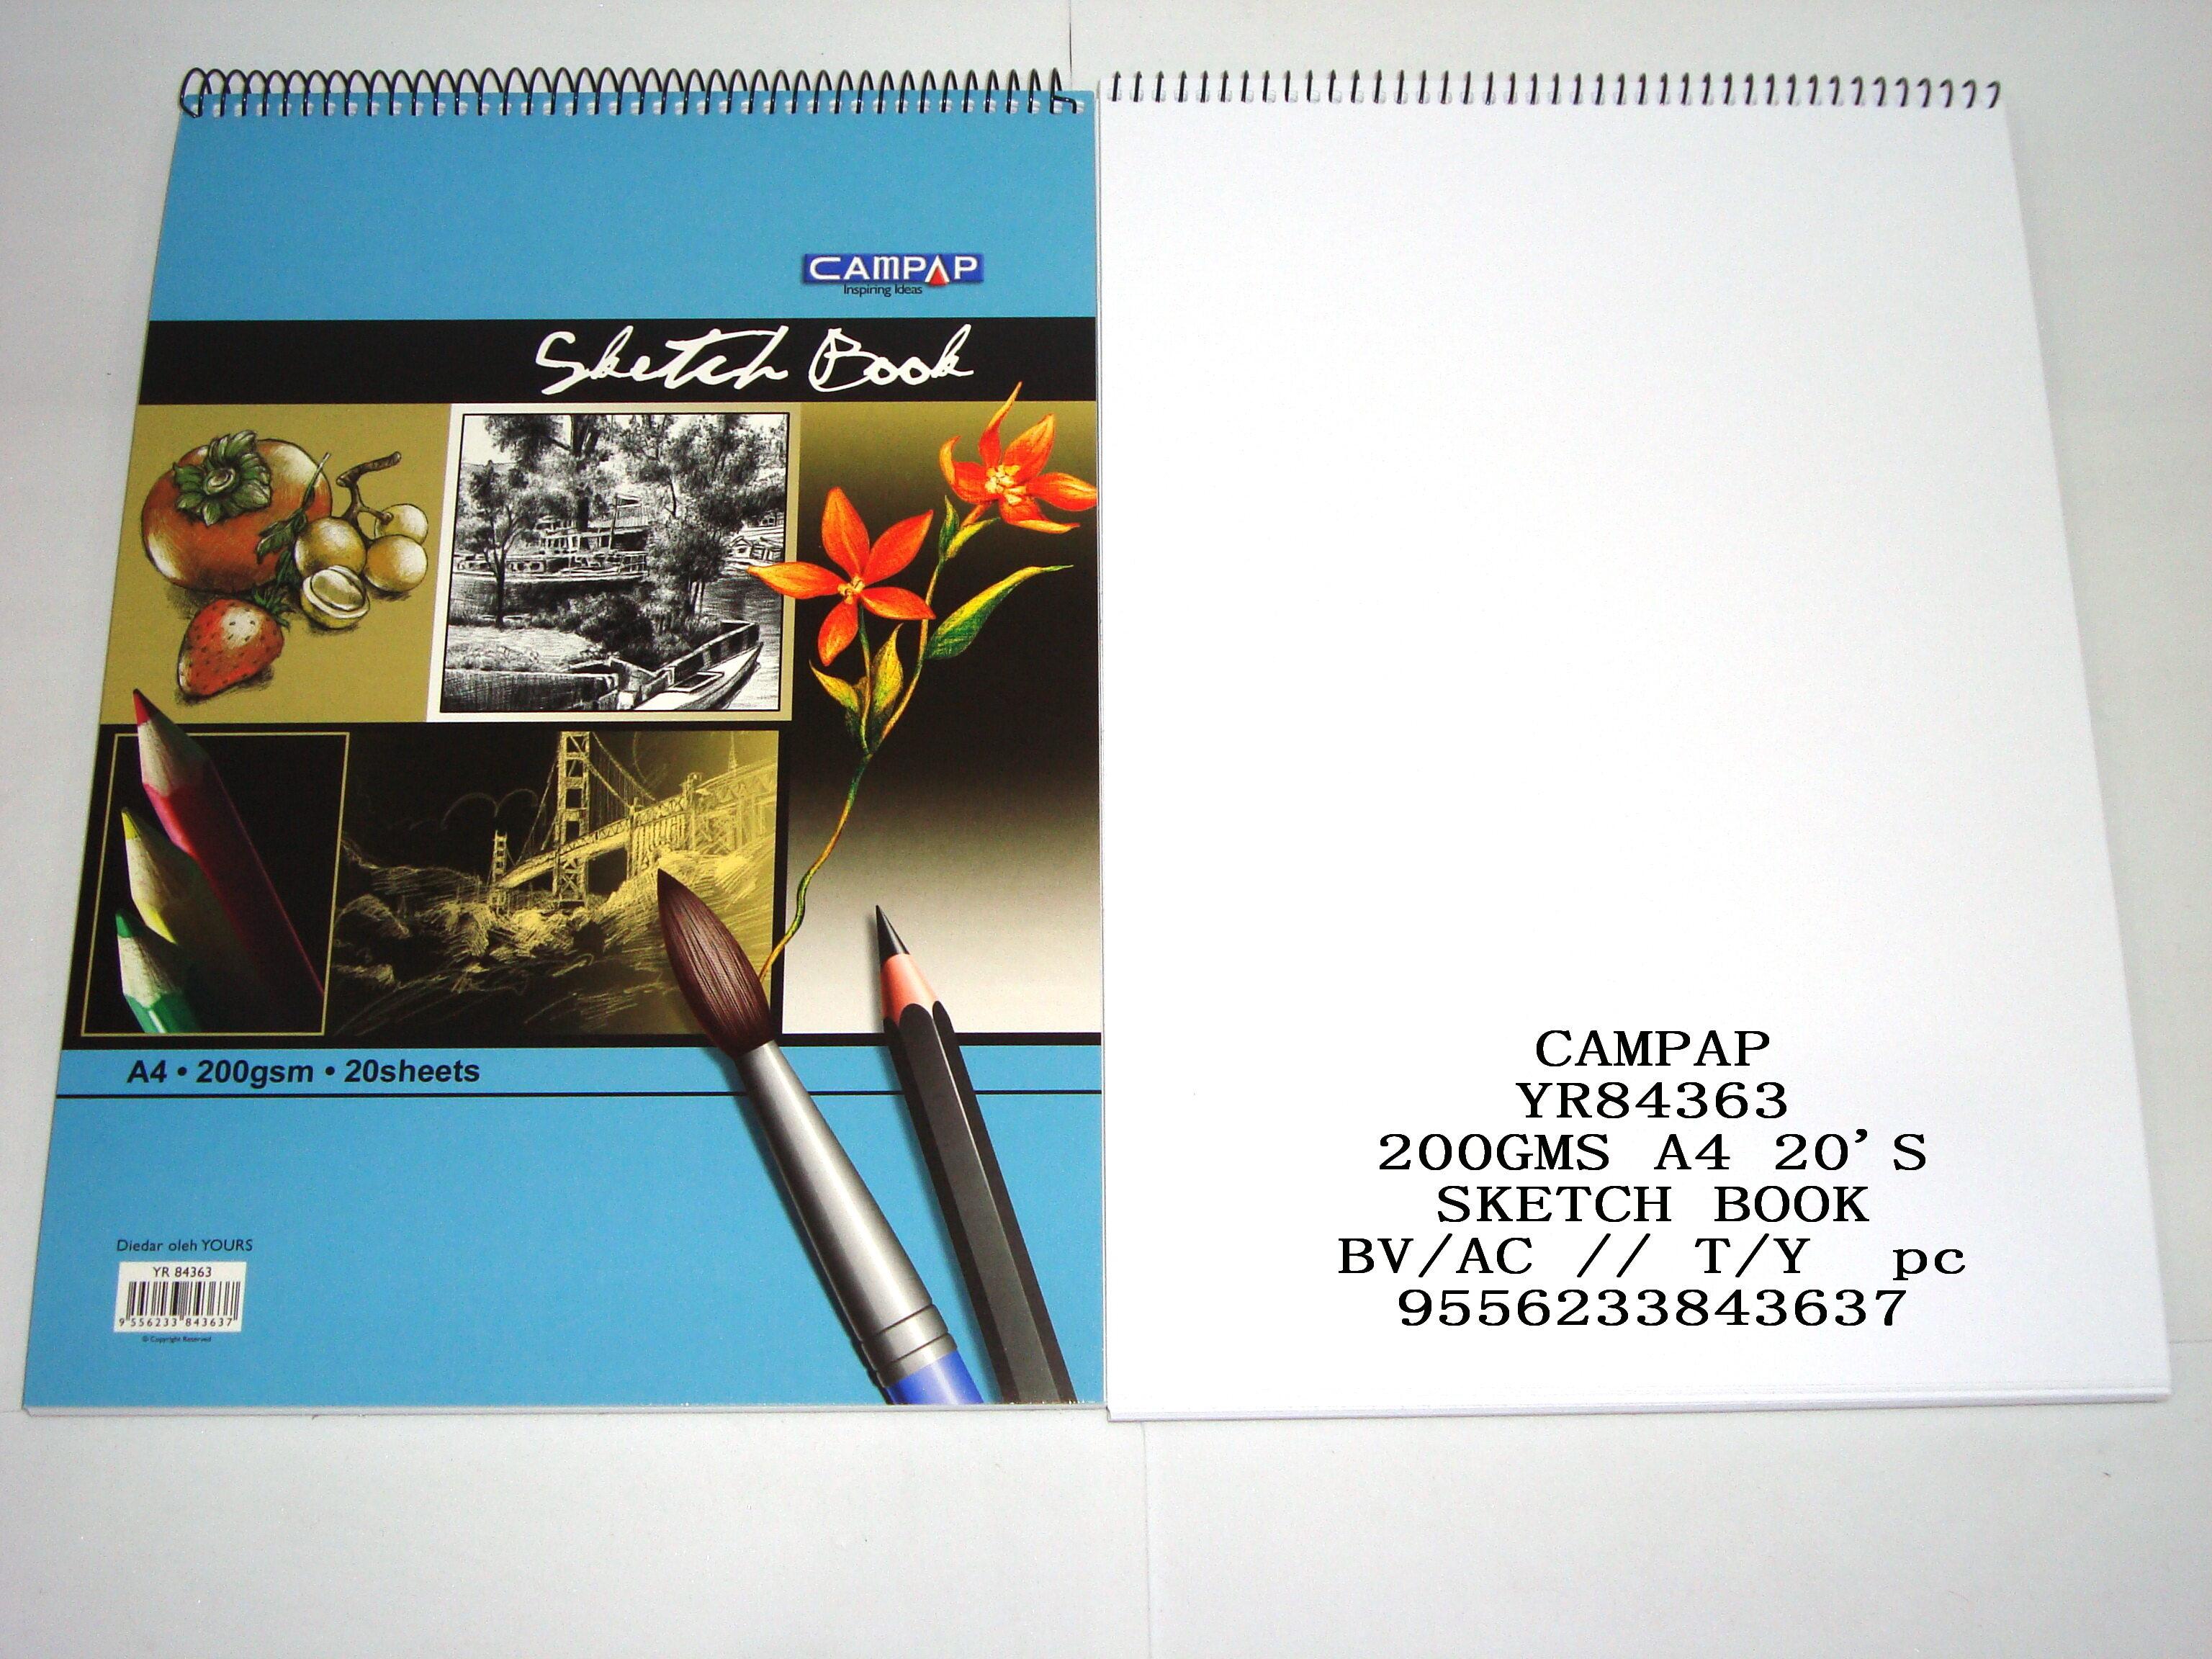 CAMPAP YR84363 200gms 20's A4 SKETCH BOOK